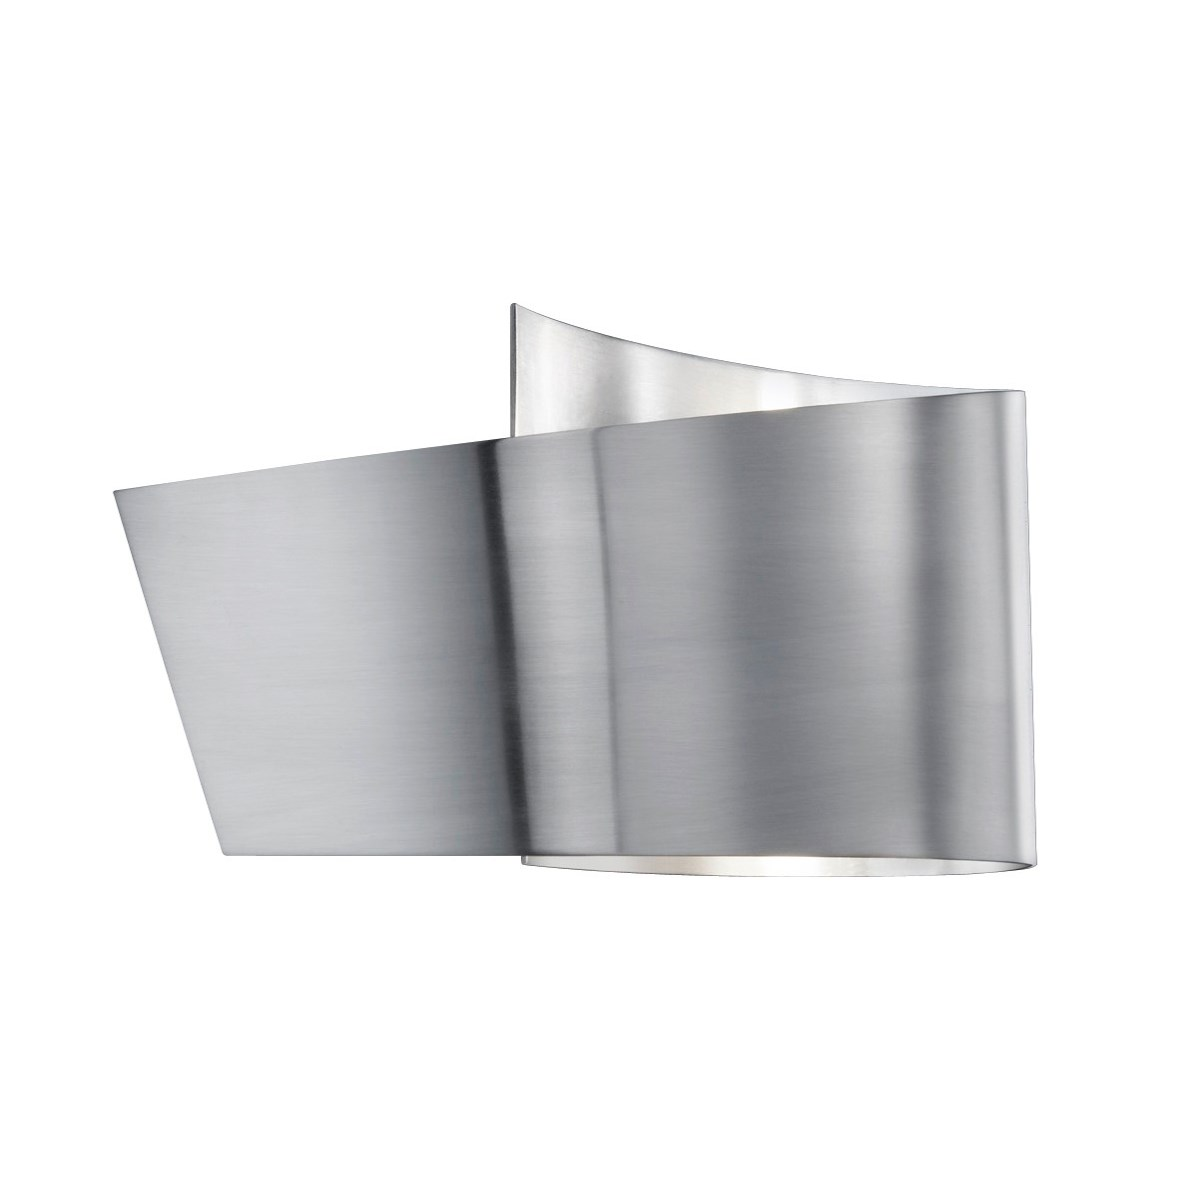 H2O Ribbon Wall Sconce in Satin Nickel